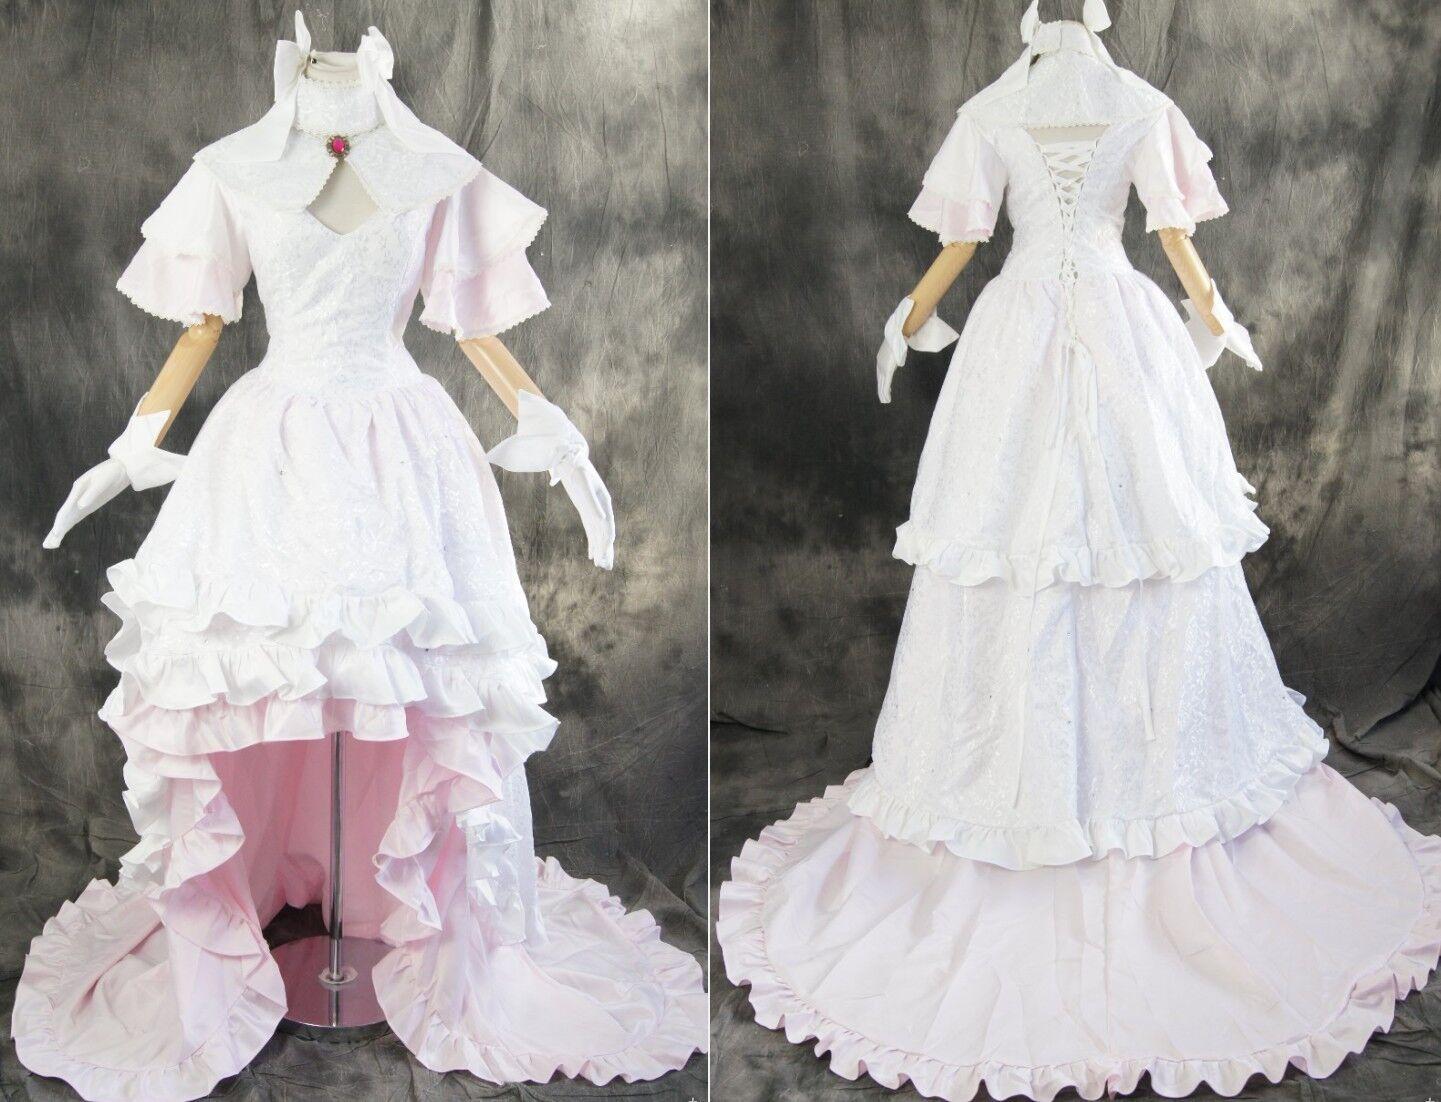 H-031 puella Magi Madoka Magica Final Form cosplay costume robe robe robe costume Dress e31d2a